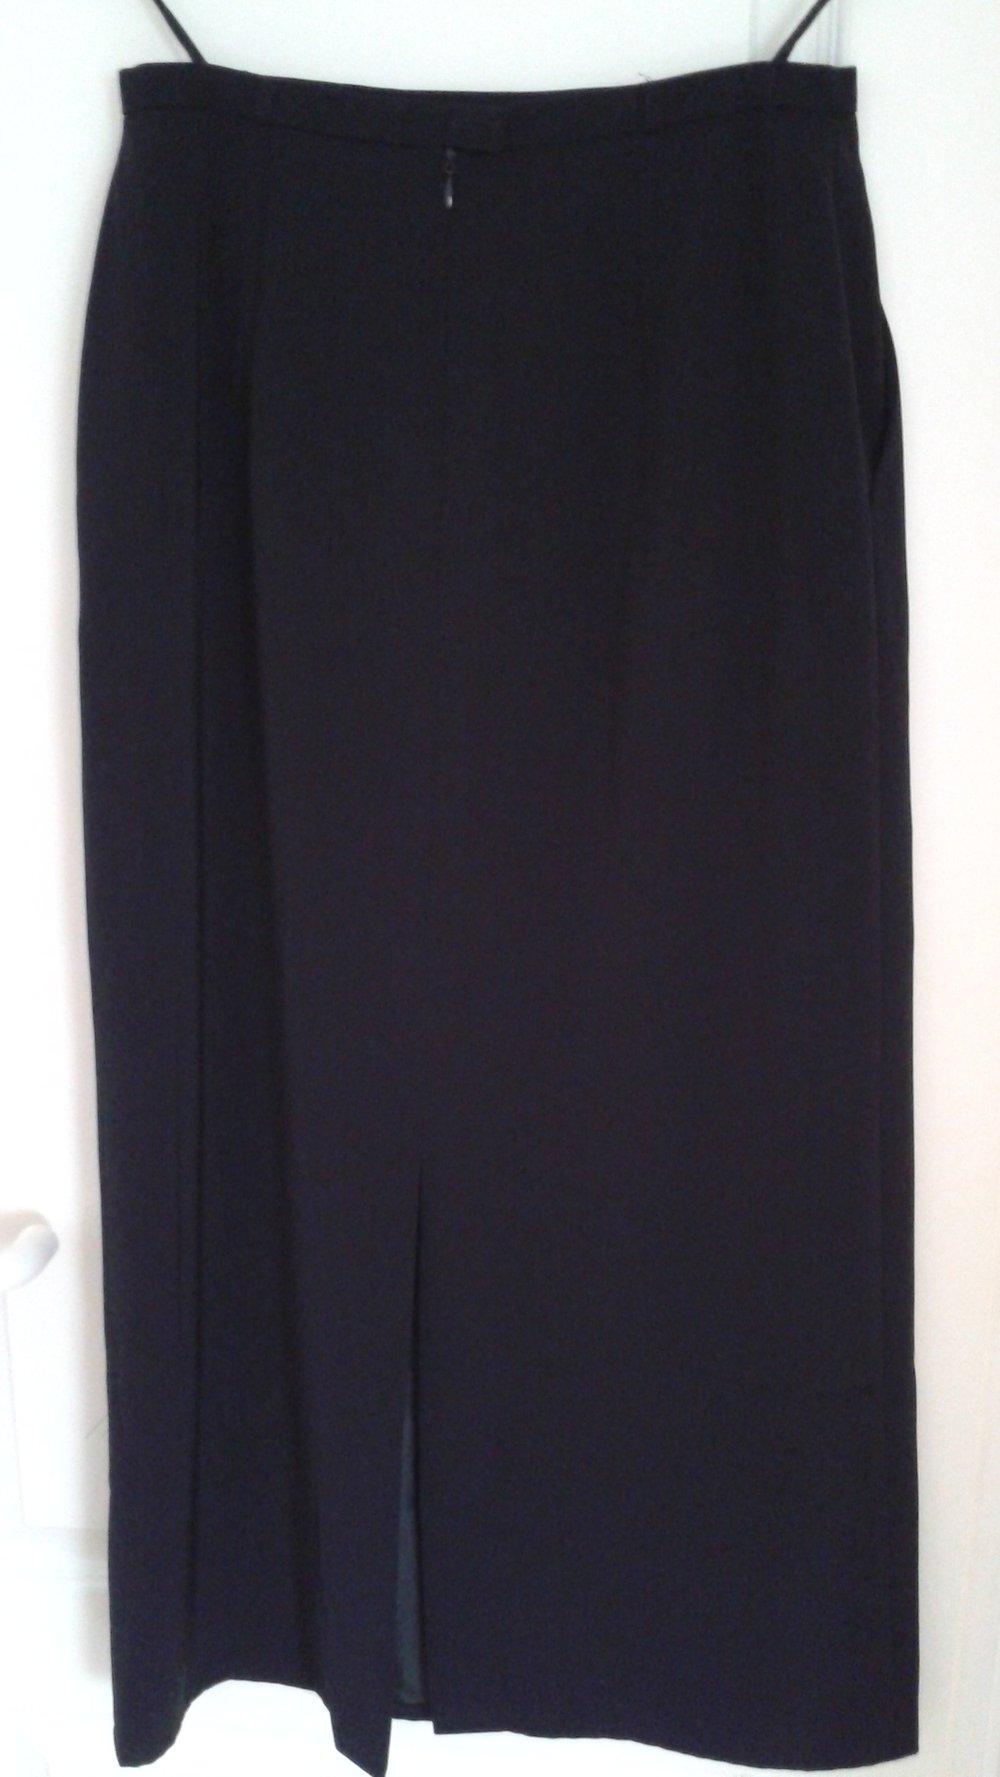 5e07621a0a96 langer Damenrock - 93 cm - schwarz - Fabiani - Gr. 38    Kleiderkorb.de